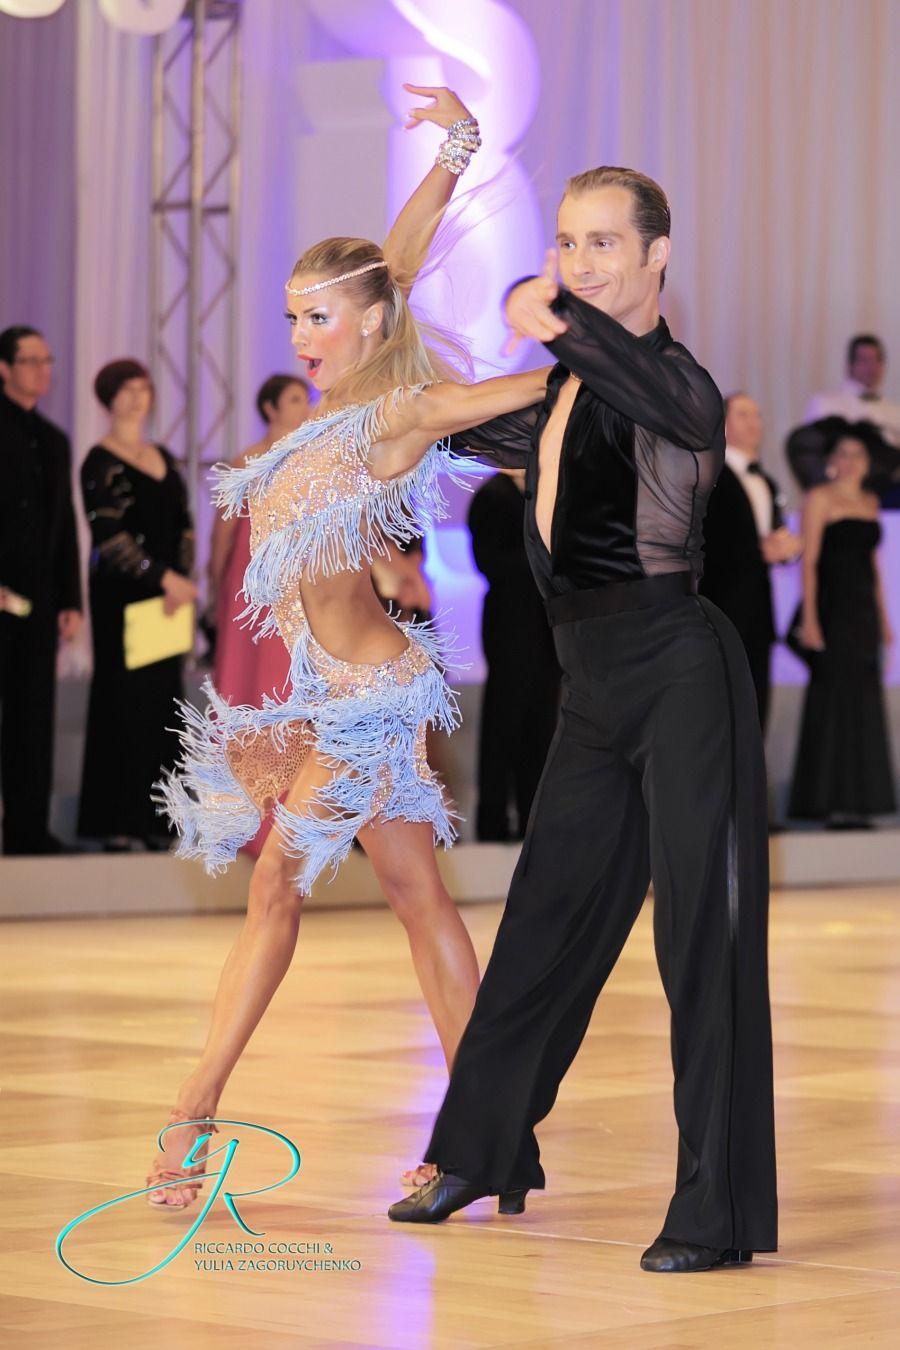 Cha cha. In my next life I'll be a professional ballroom dancer ...